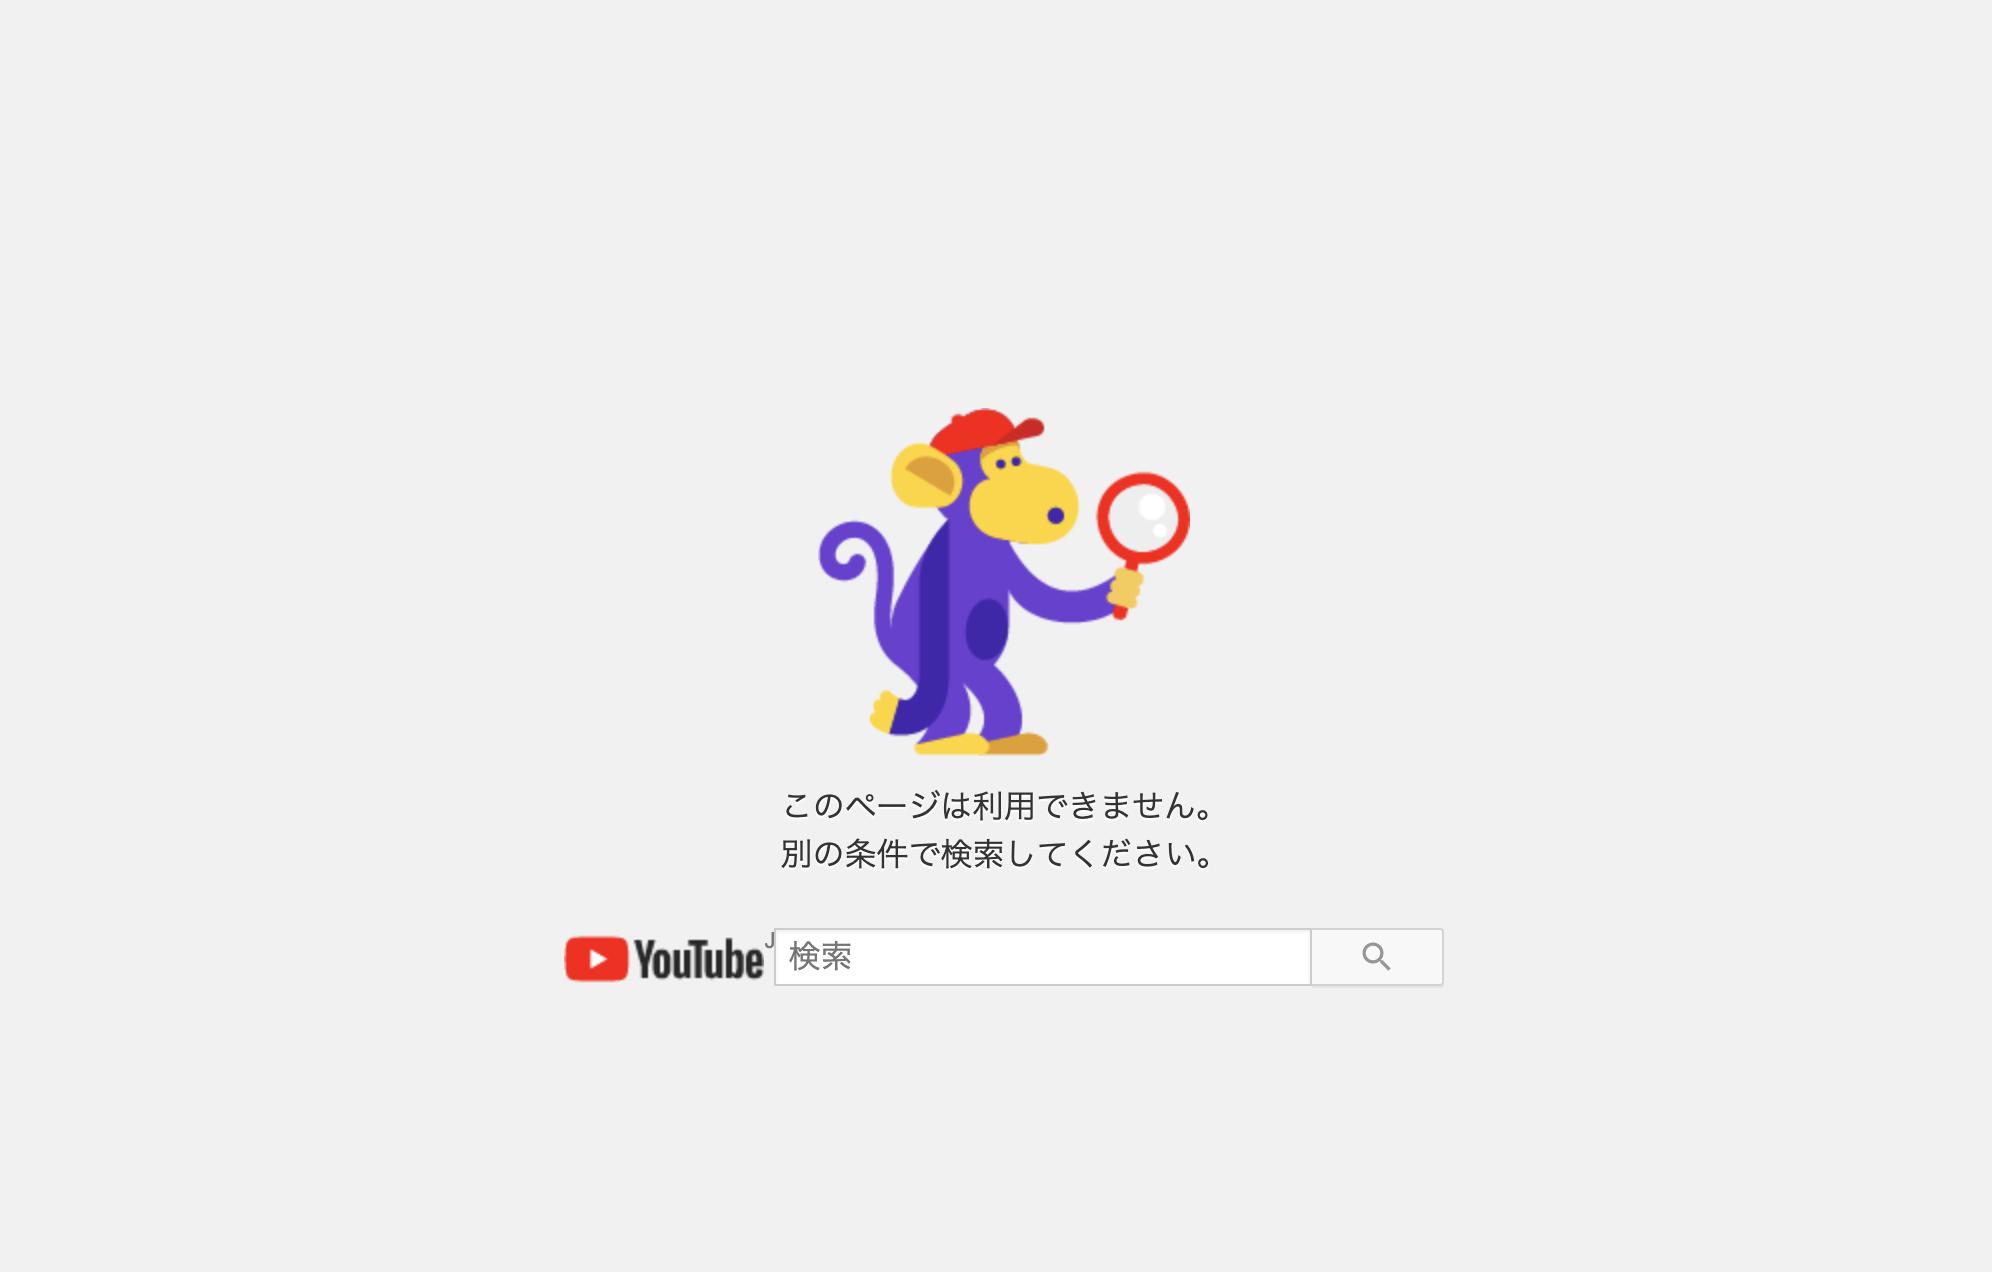 YouTube_カスタム404ページ